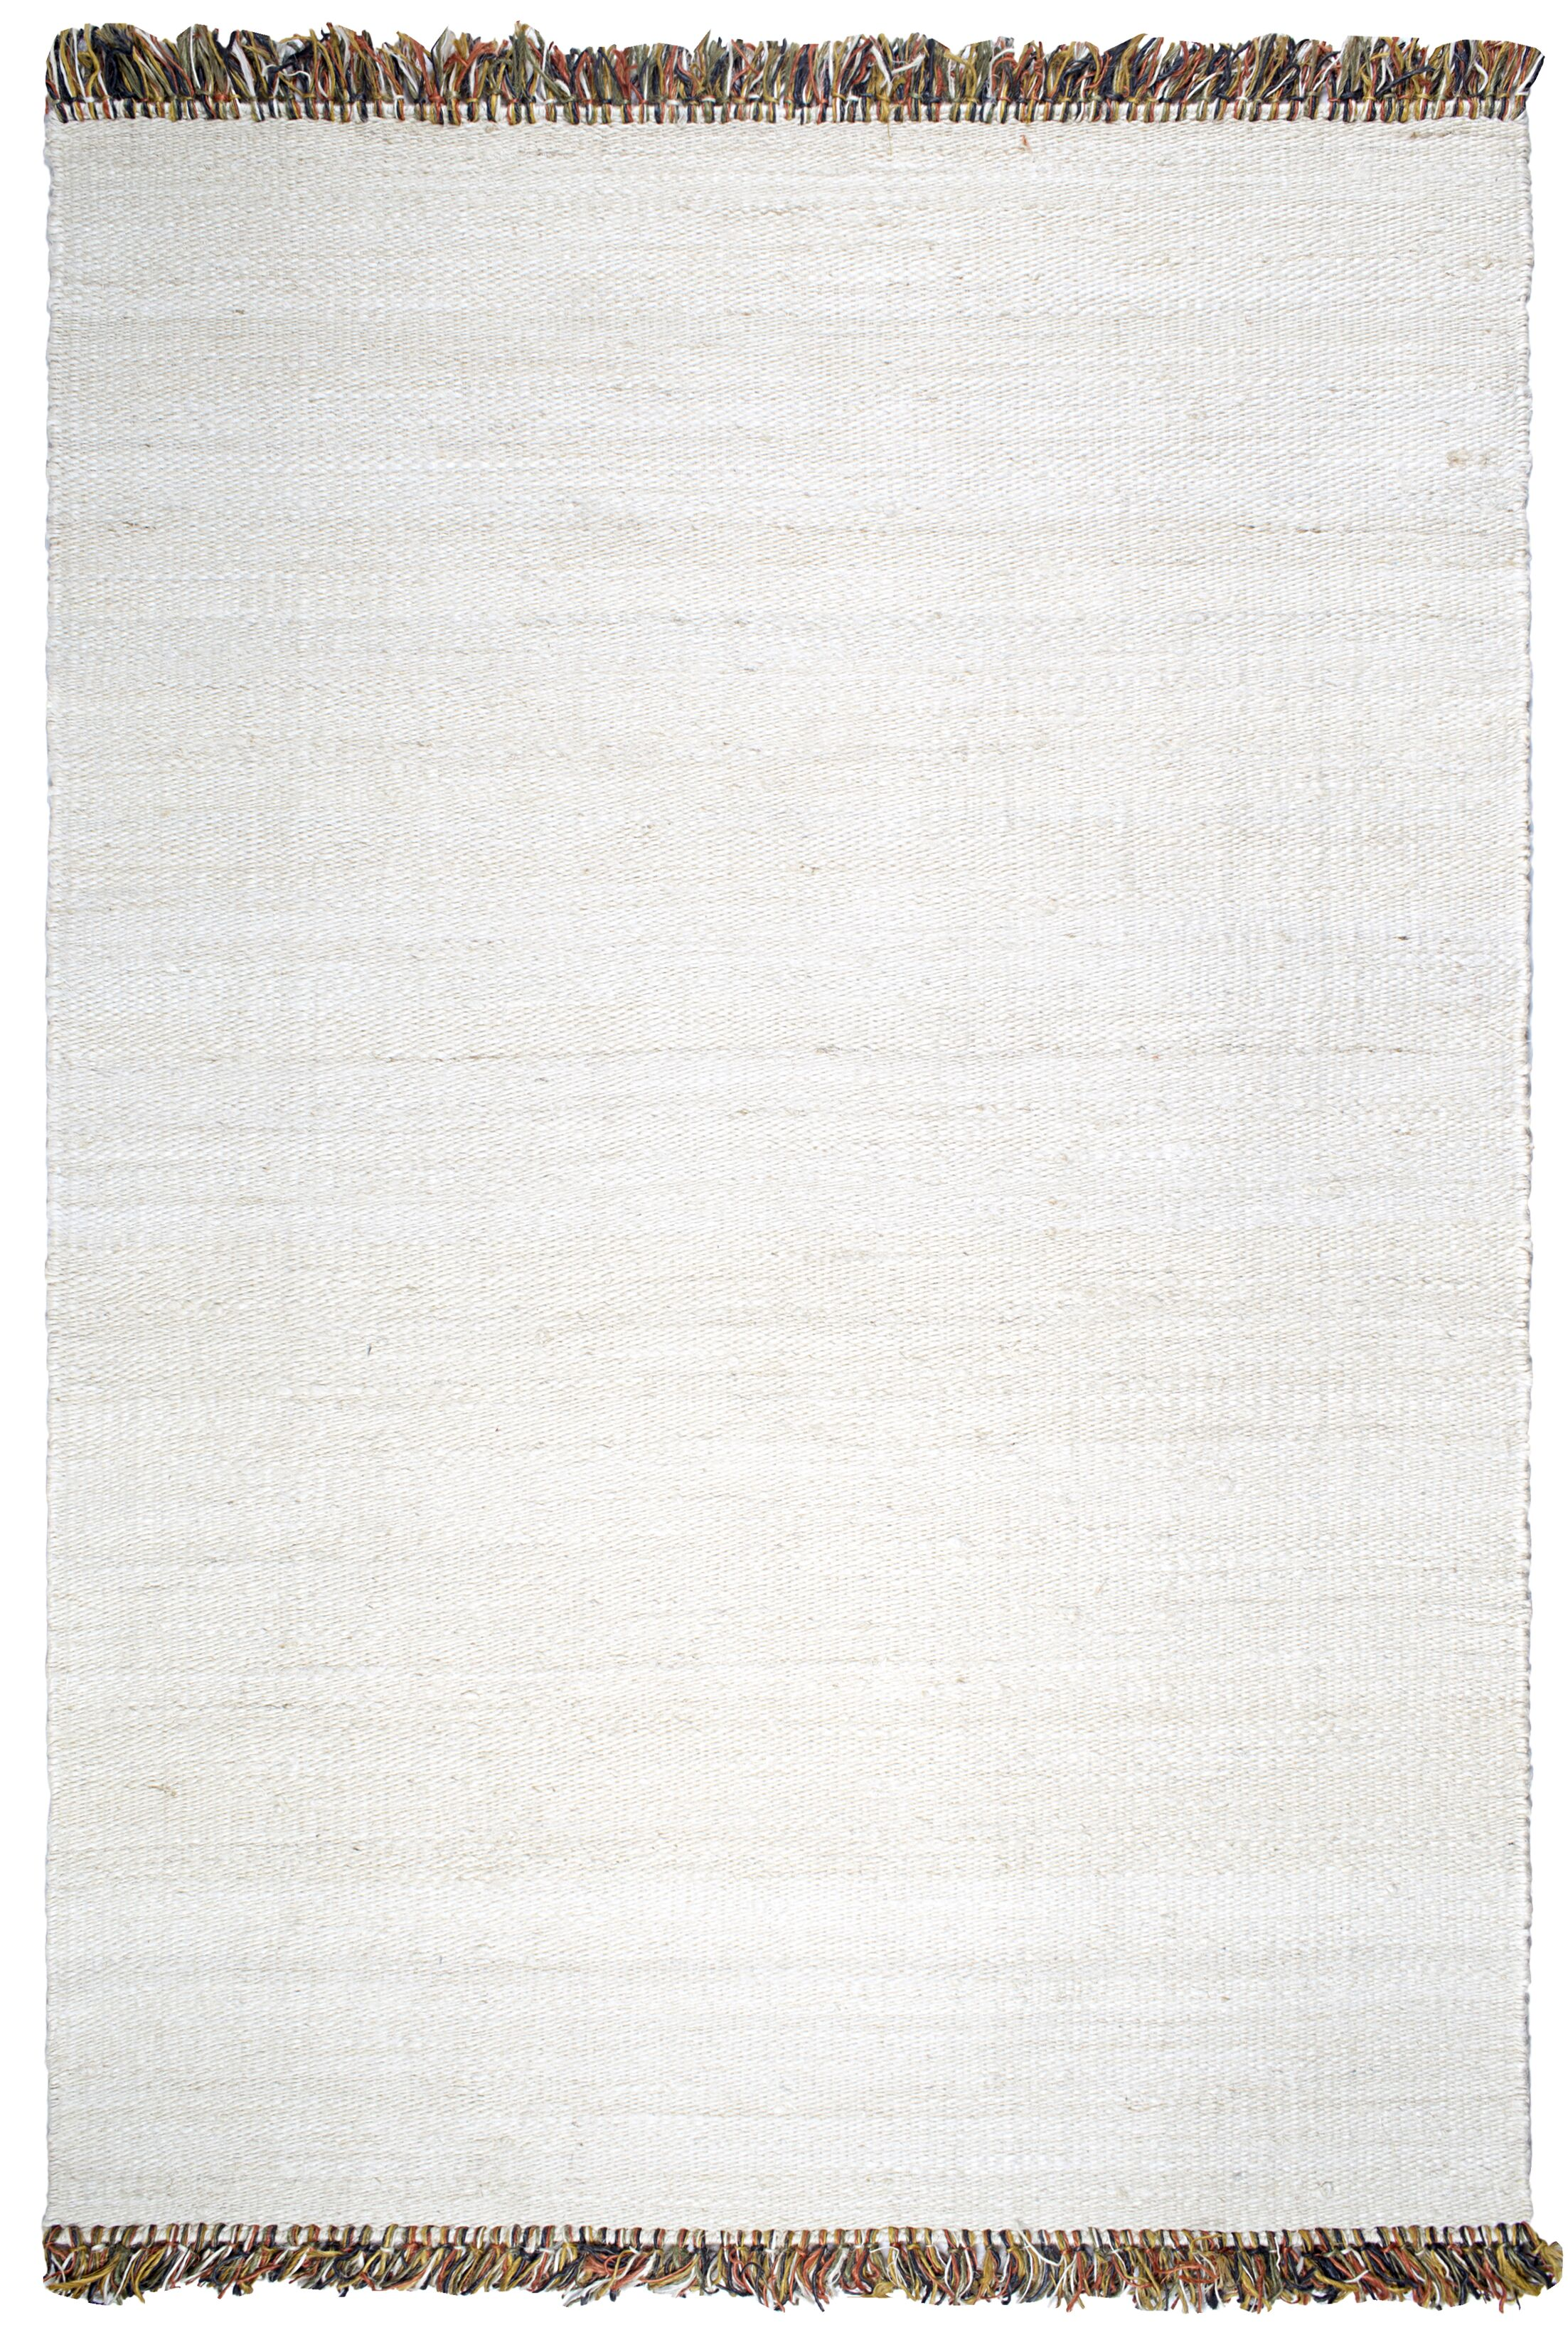 Skidmore Saguaro Hand-Woven White Area Rug Rug Size: 8' x 10'